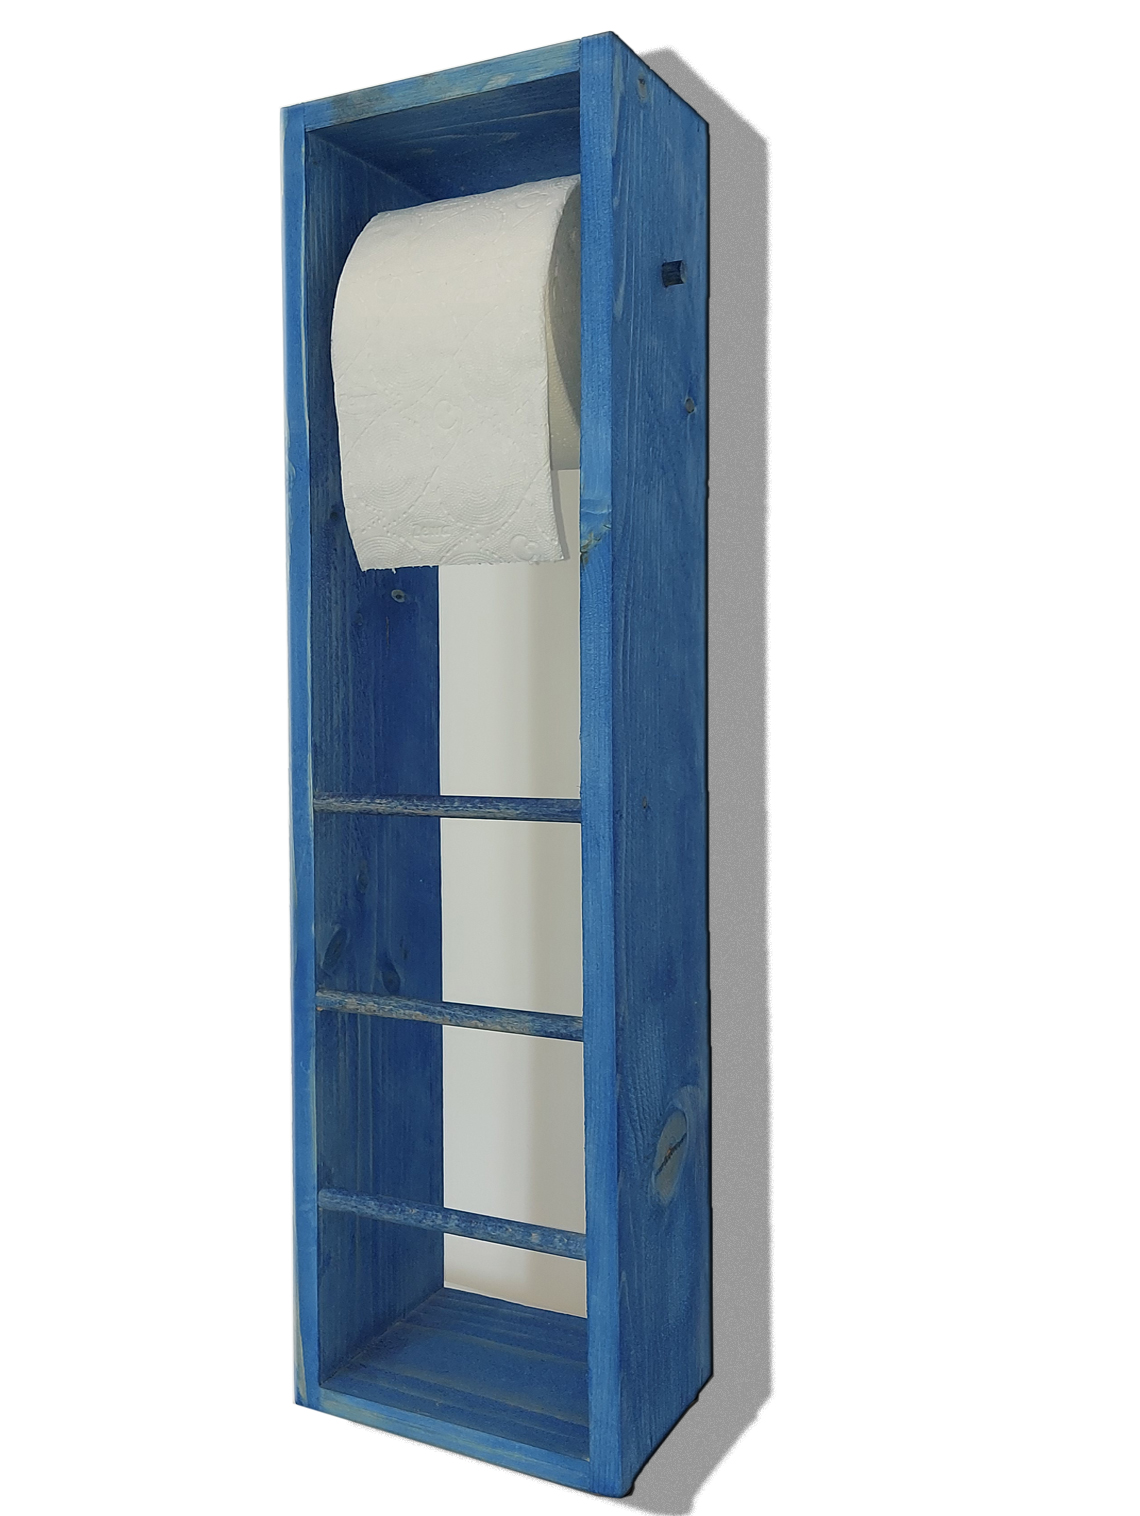 Suport hartie igienica din lemn Homs, 62x14 cm,albastru